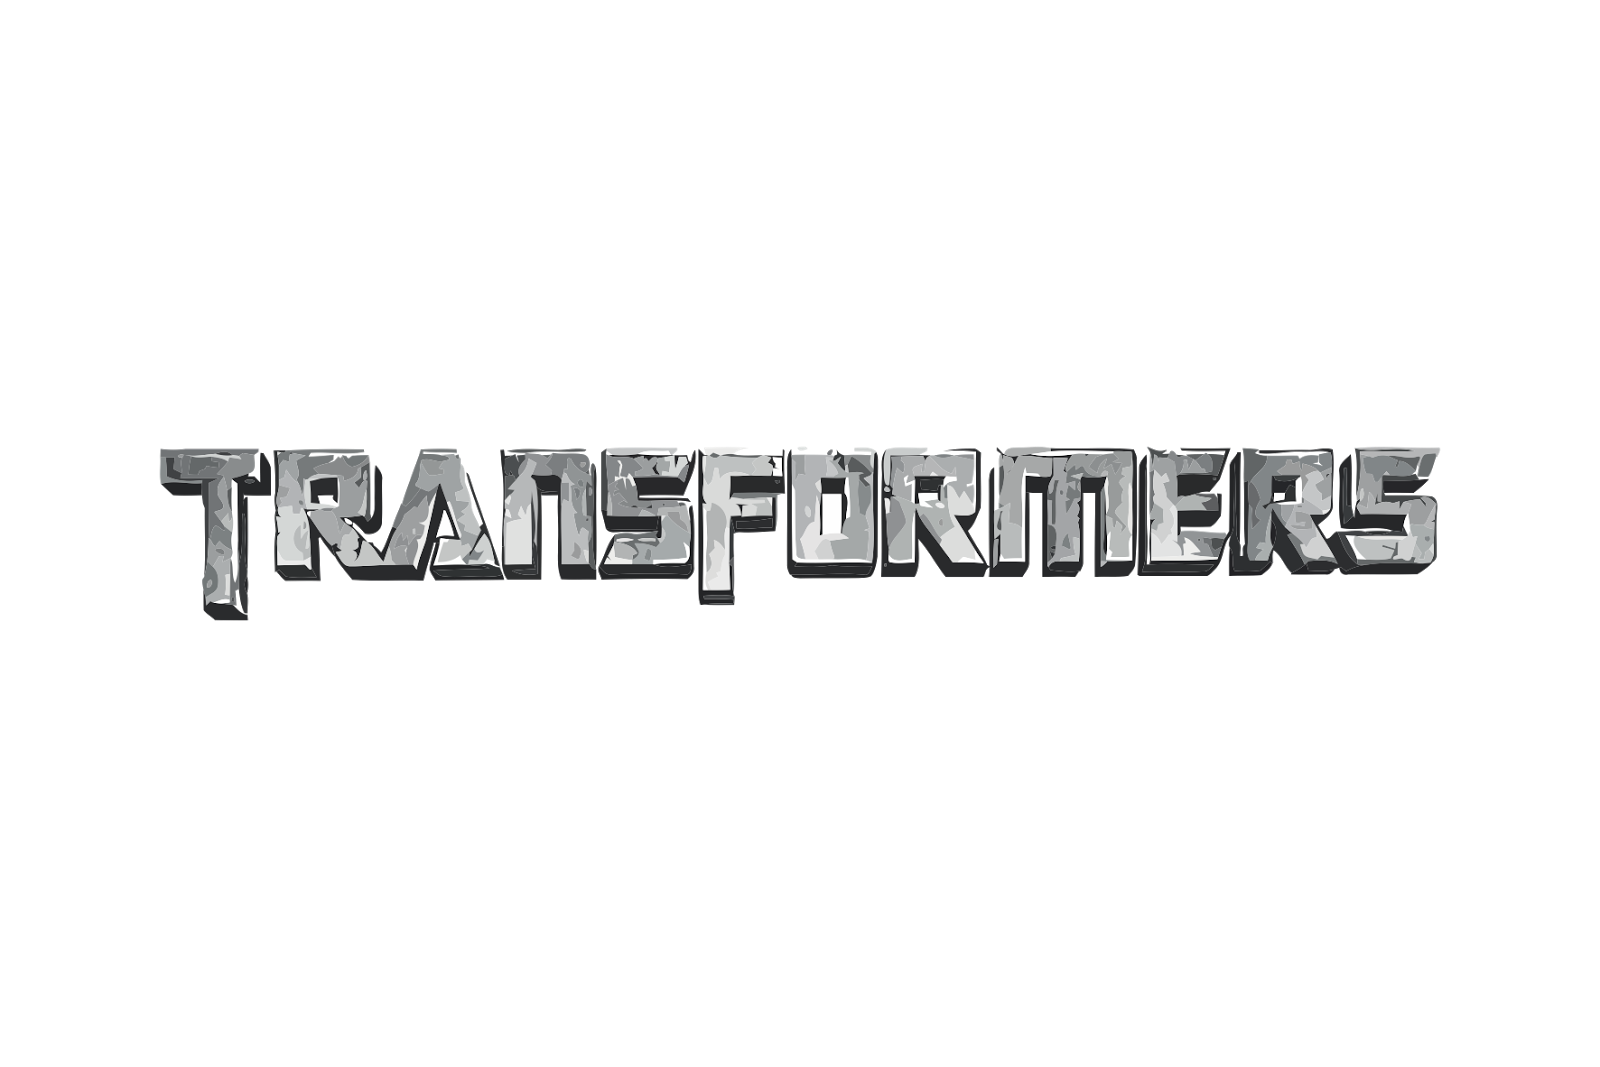 transformers silver logo hd image 19561 transparentpng